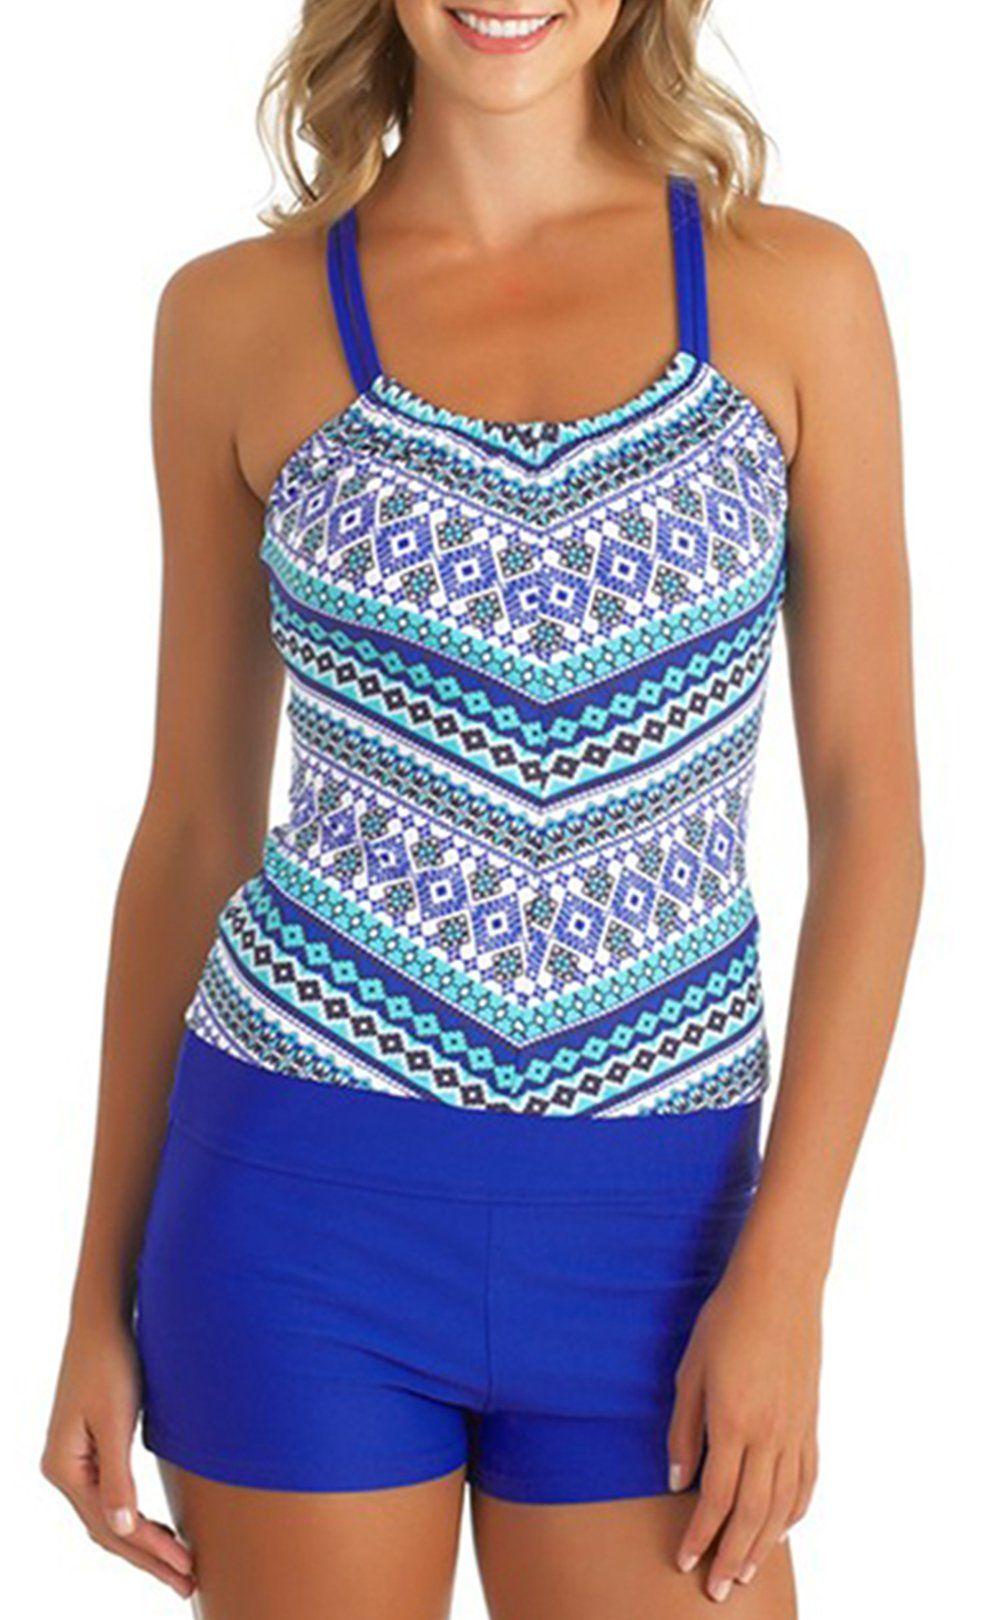 c083b175b9ecf Upopby Women s Raceback Tankini Swimwear Top with Boyleg Set Bathing Suits  Two Piece Swimsuits Blue XL